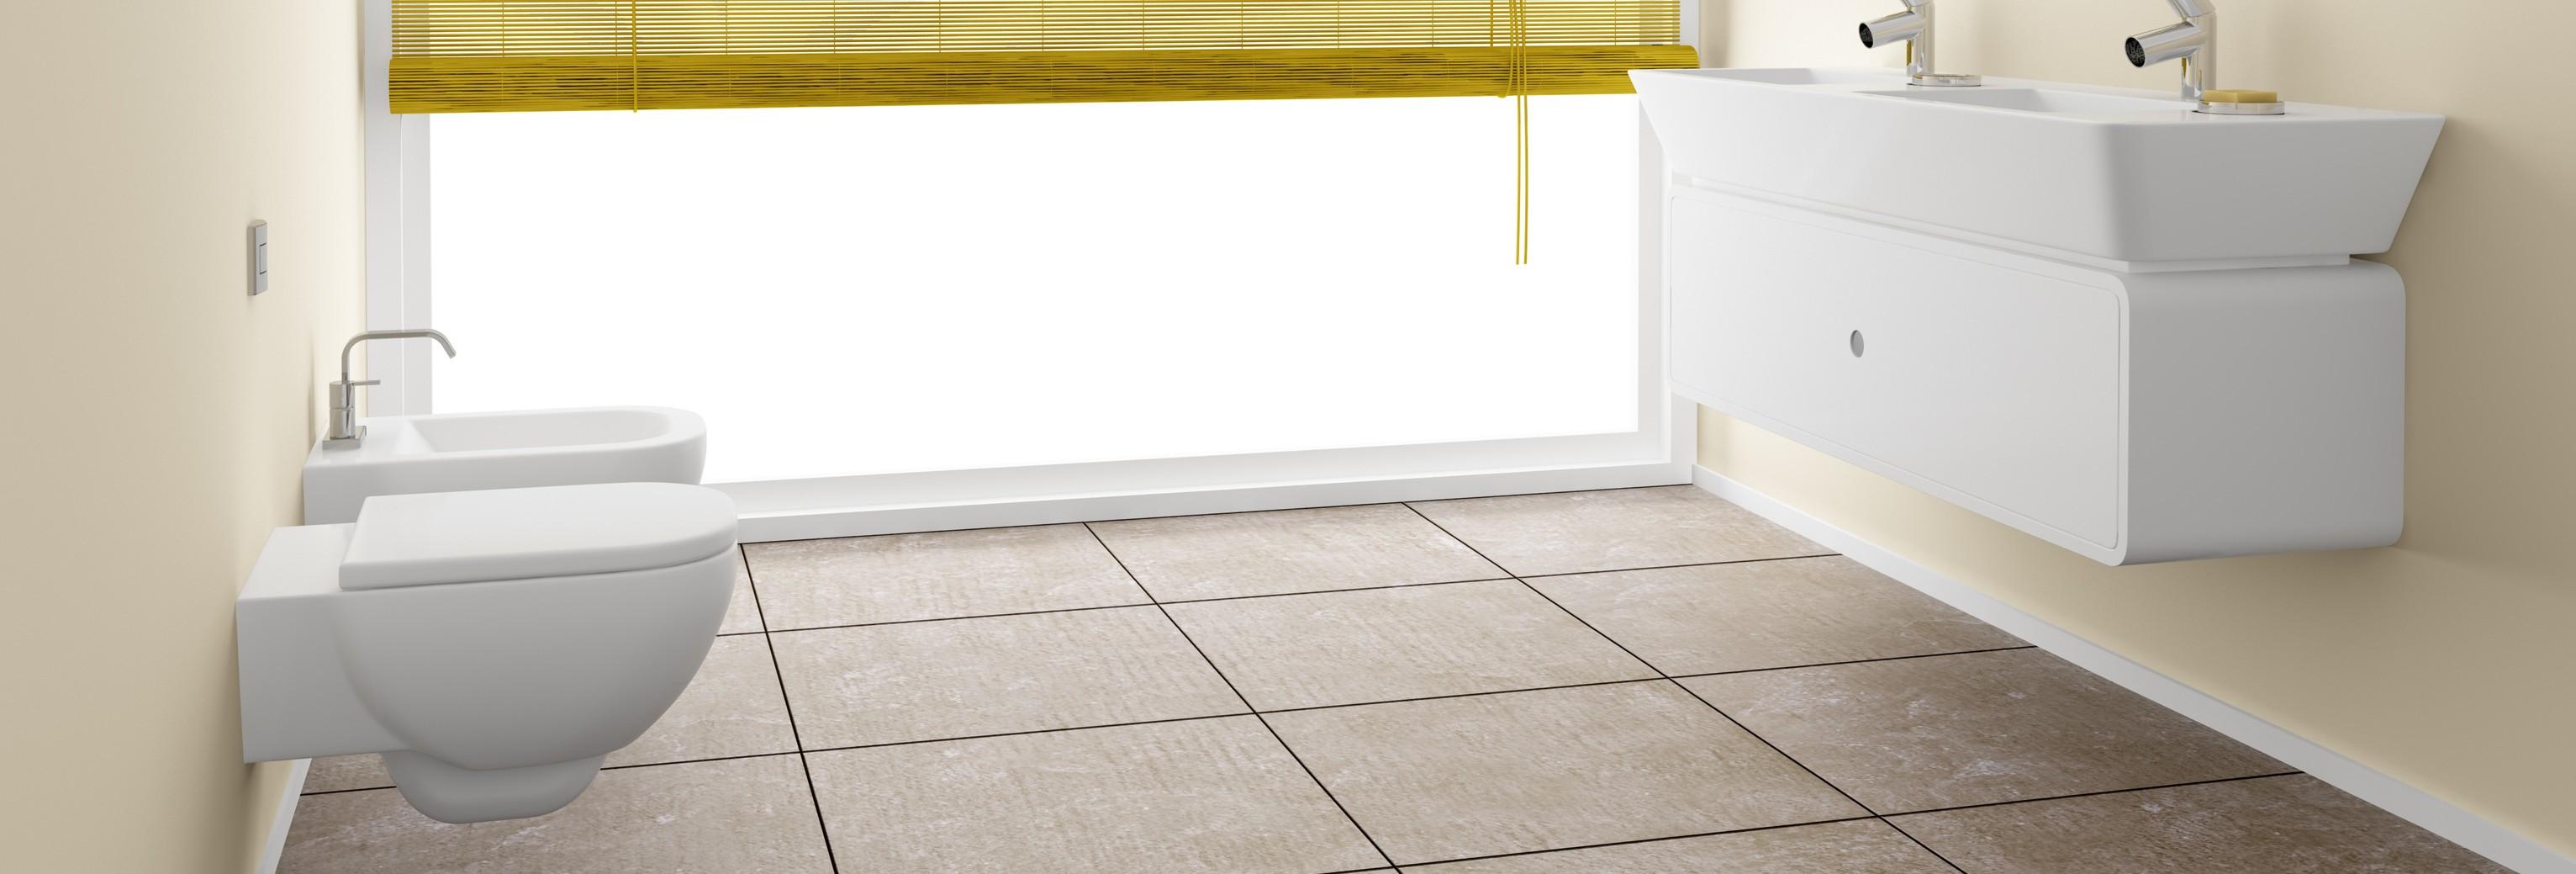 best homemade tile grout cleaner